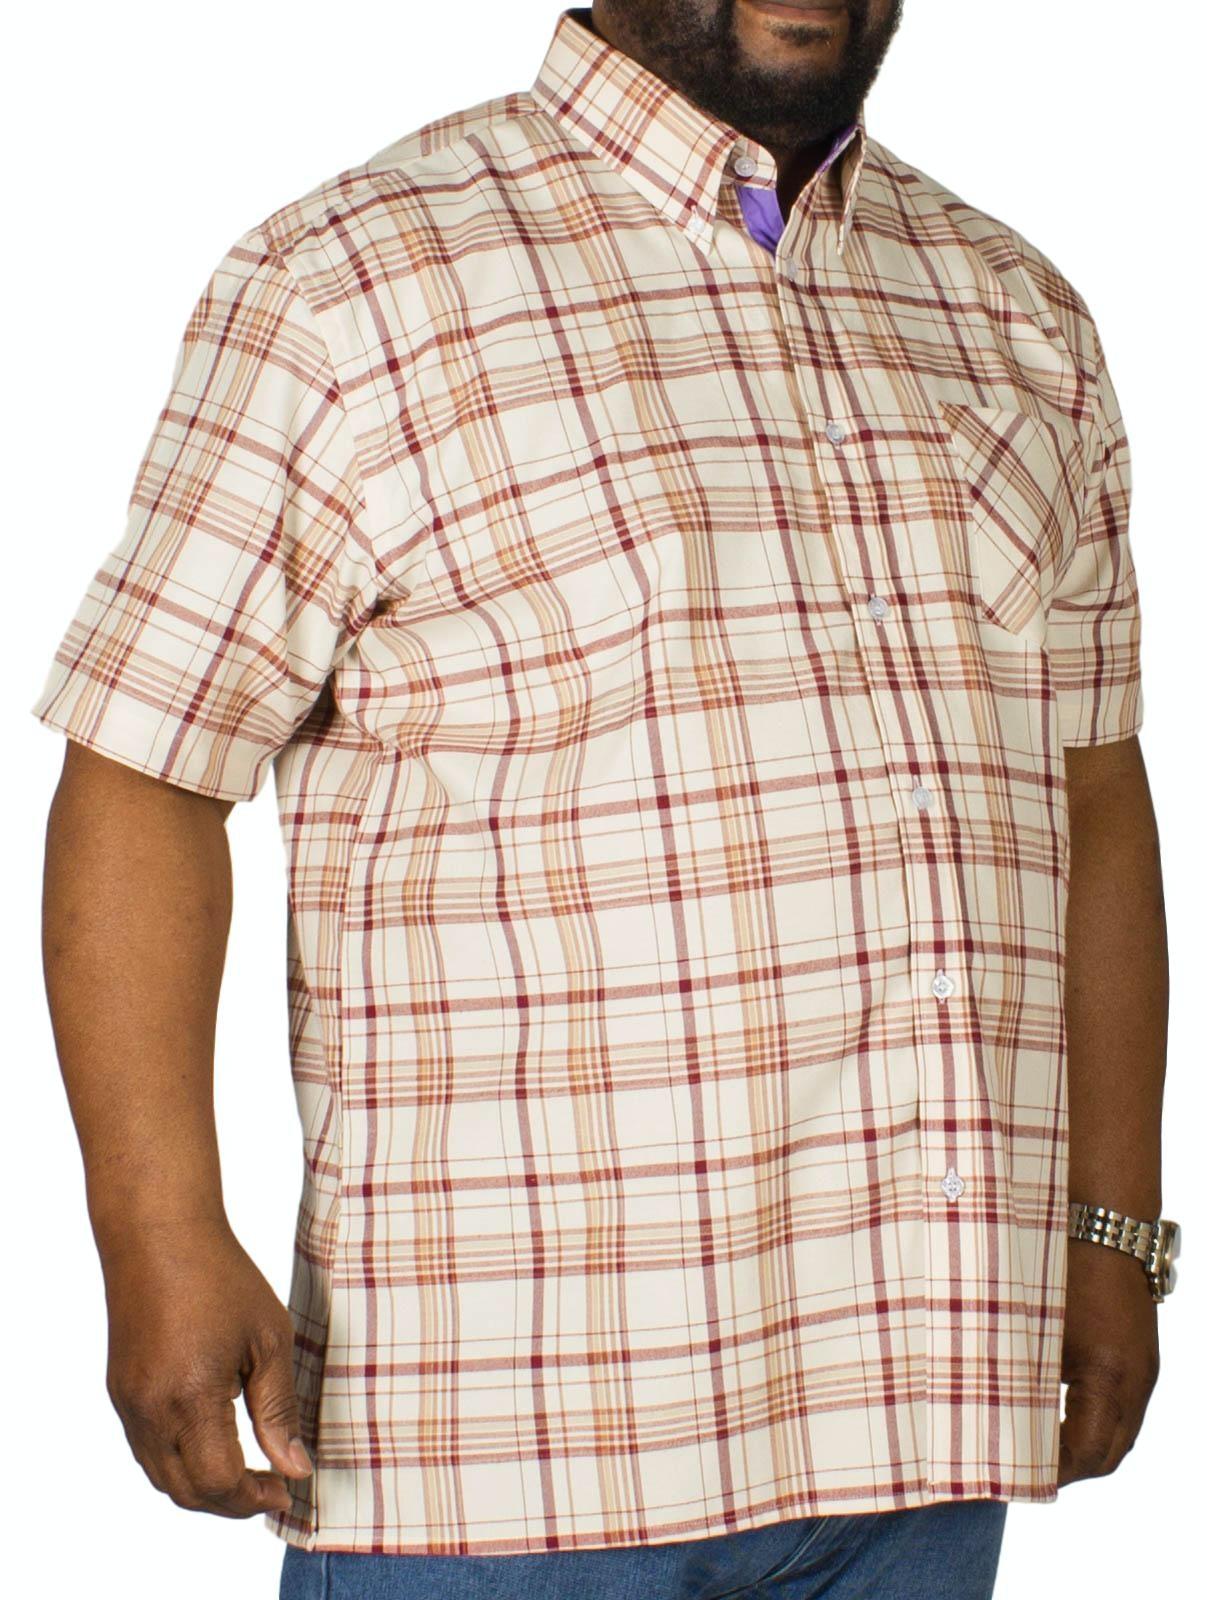 KAM Check Short Sleeved Shirt Burgundy